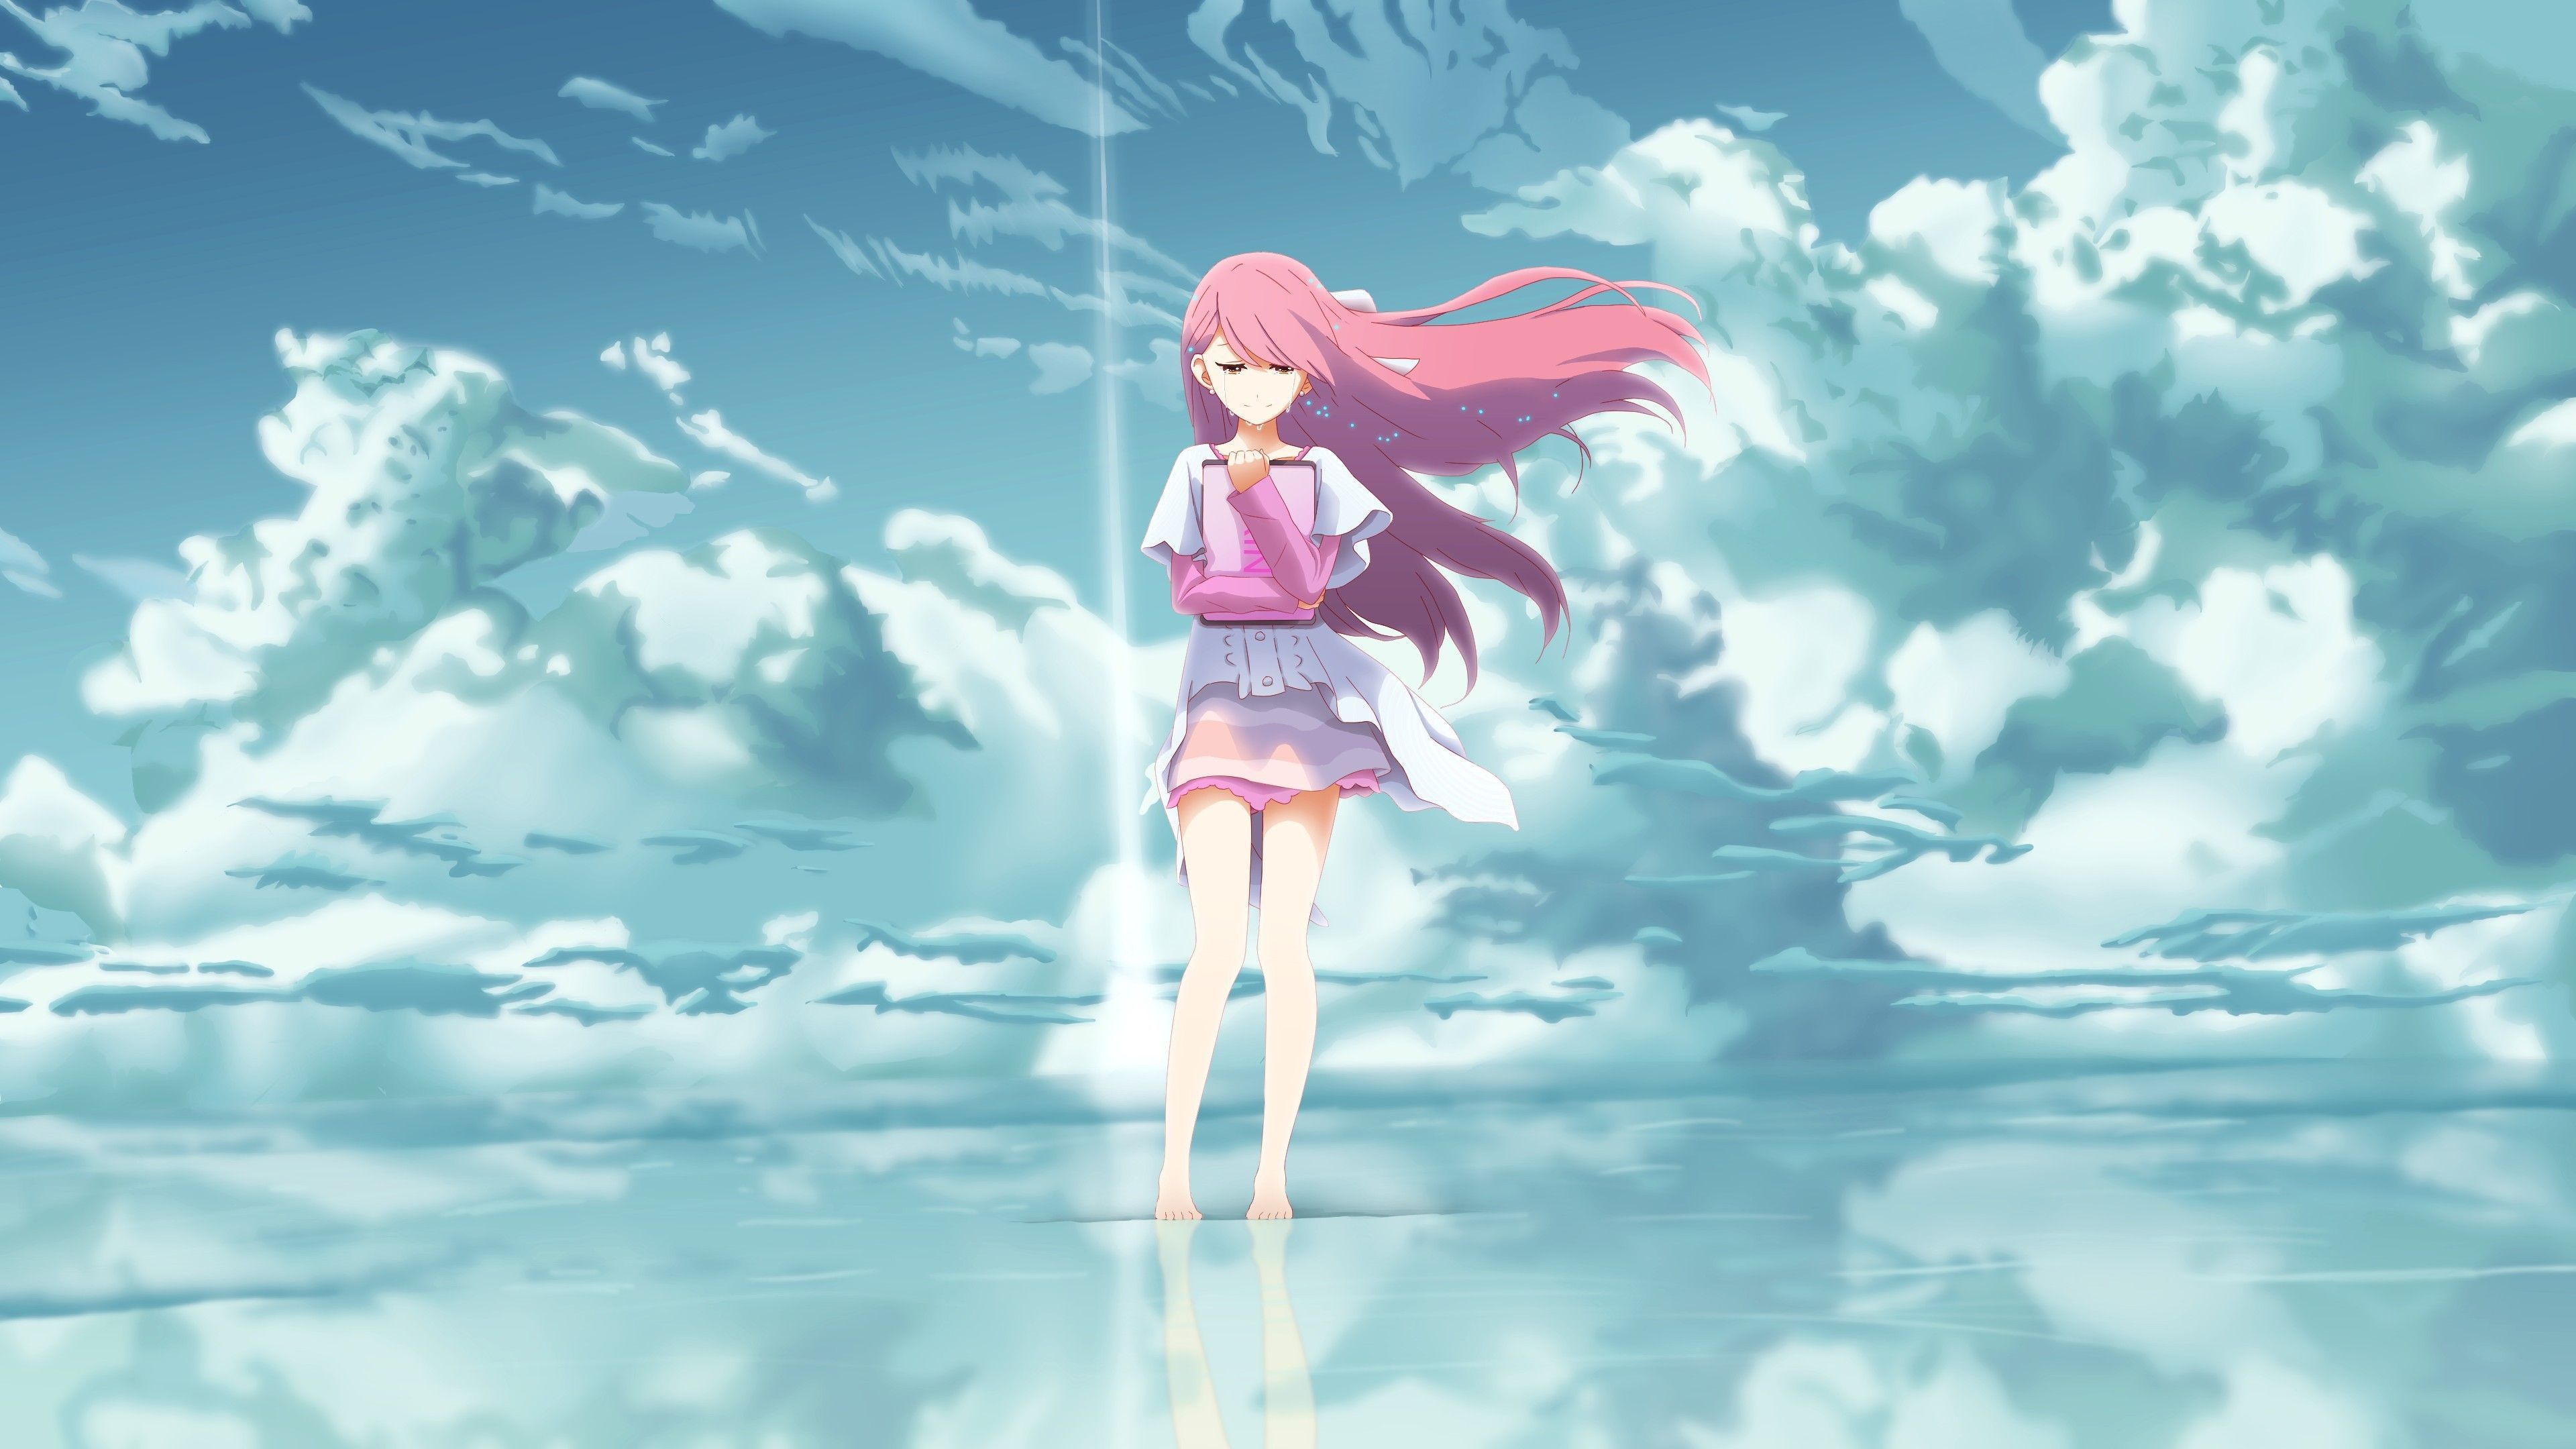 Aesthetic Anime Backgrounds Posted By John Peltier